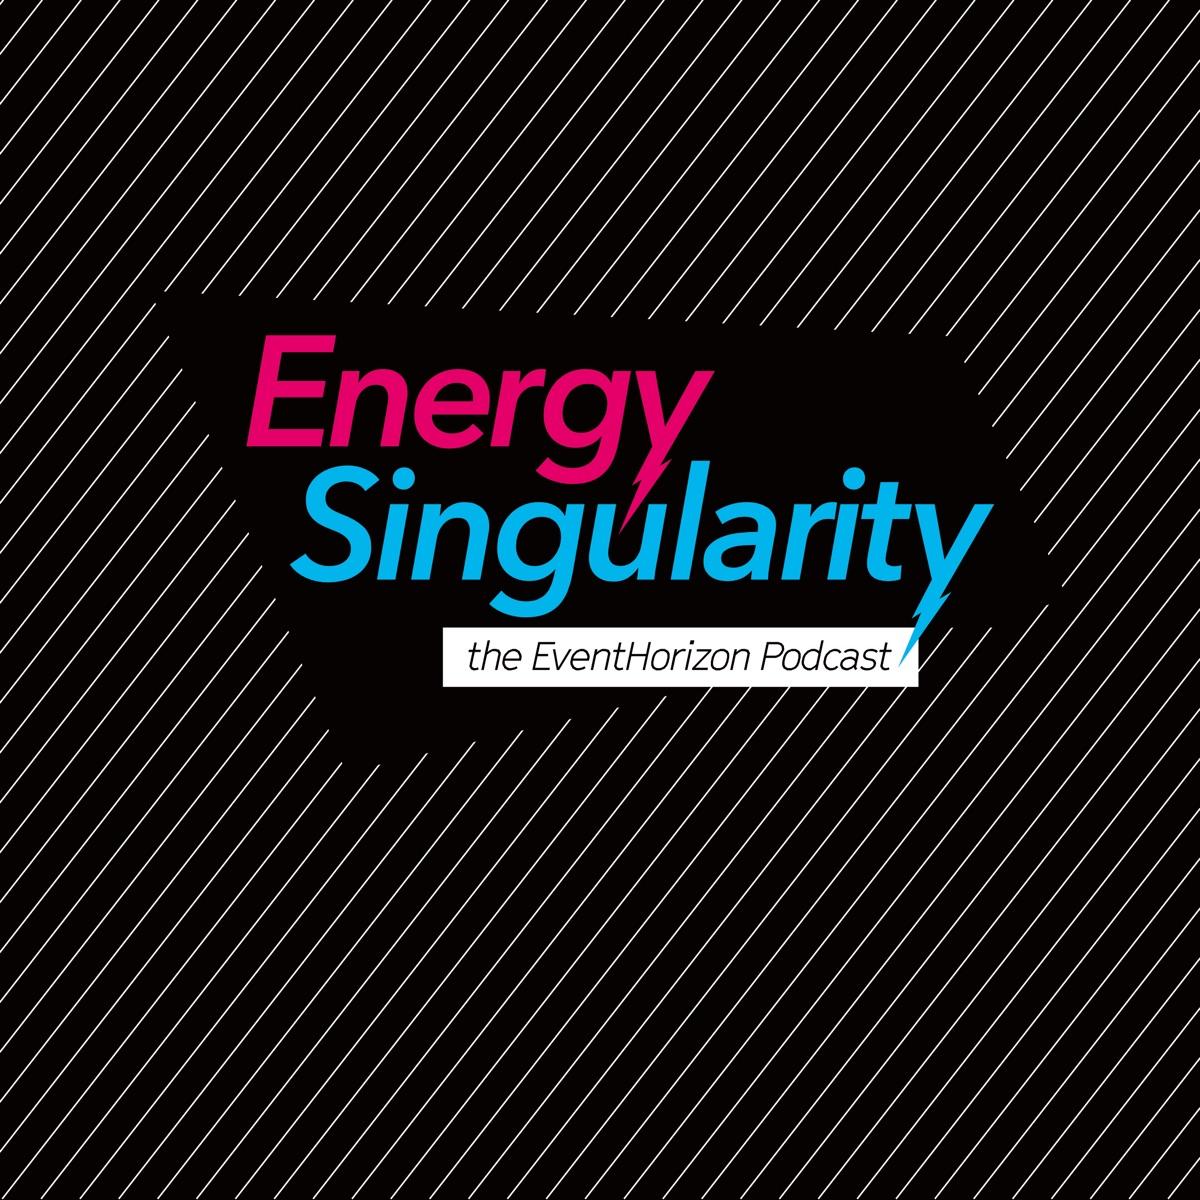 Energy Singularity - the EventHorizon Podcast